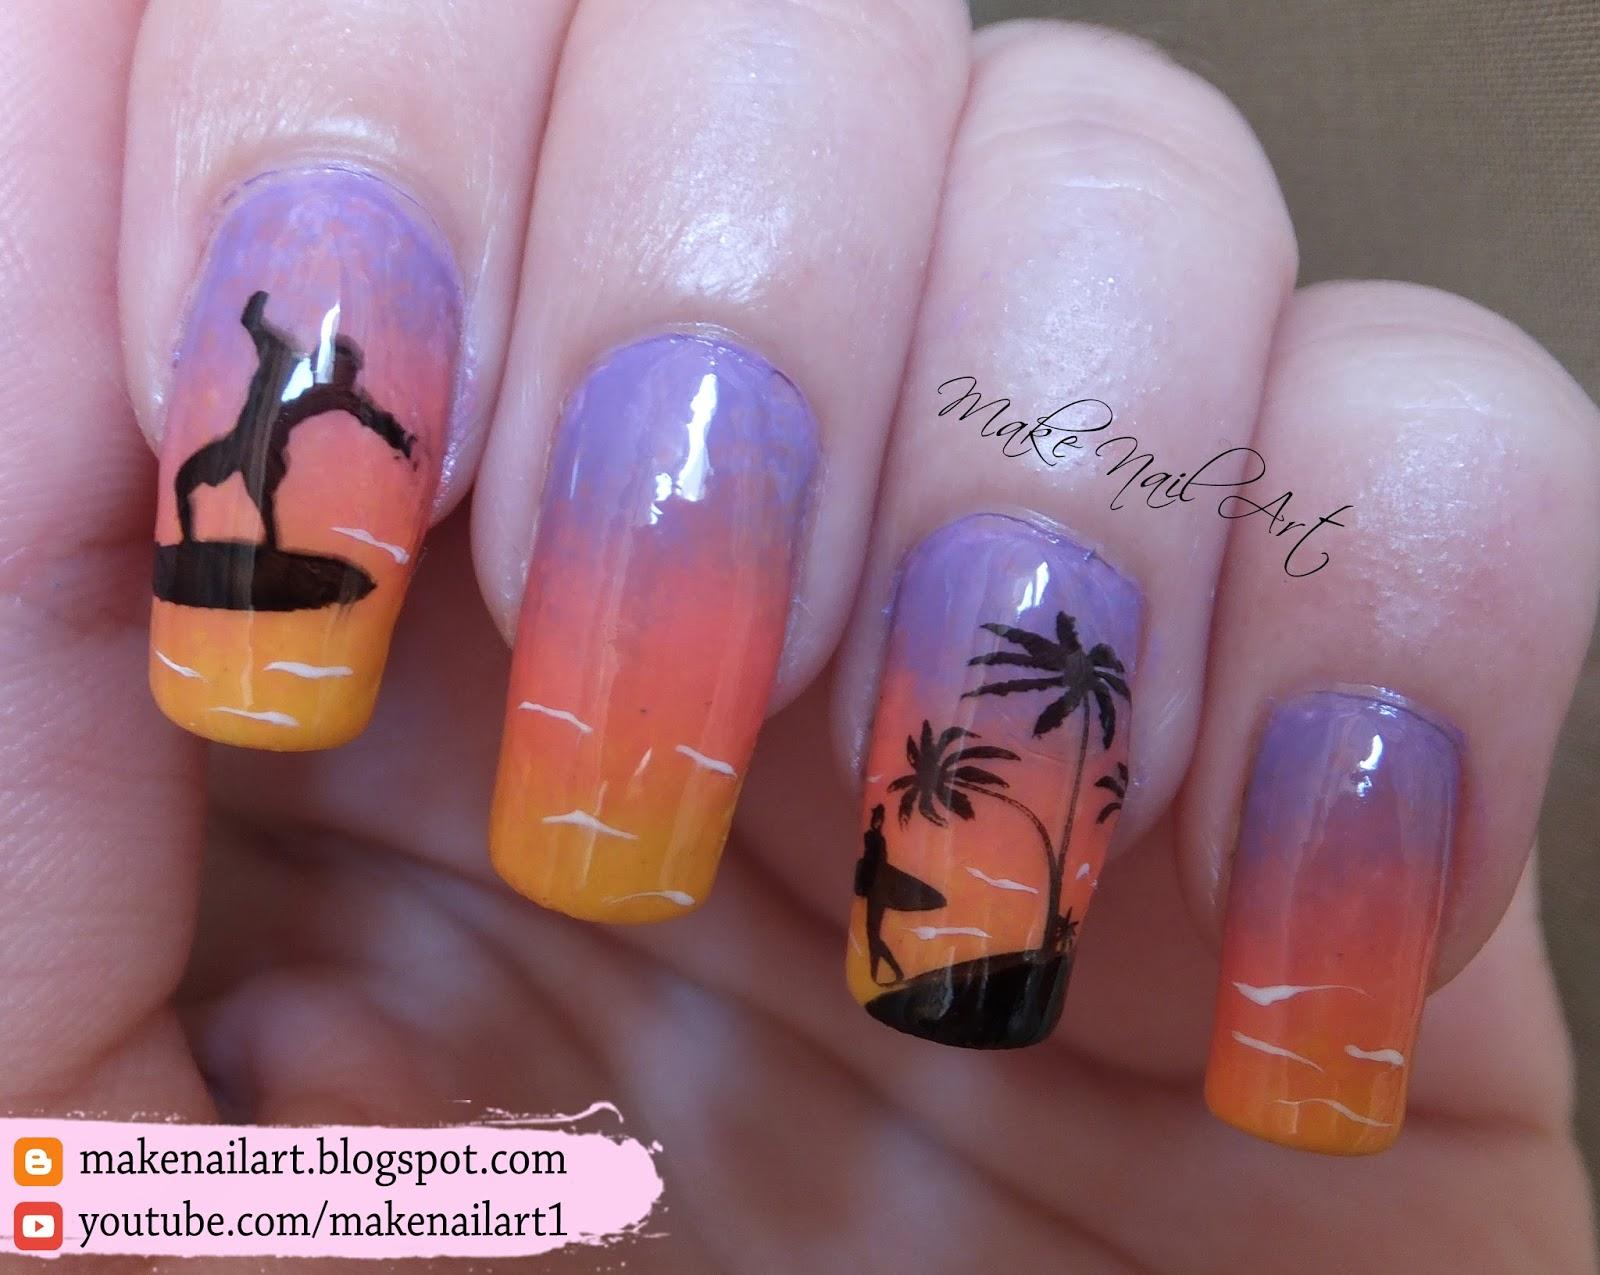 Make Nail Art: Summer Sea Sunset Stamping Nail Art Design Tutorial